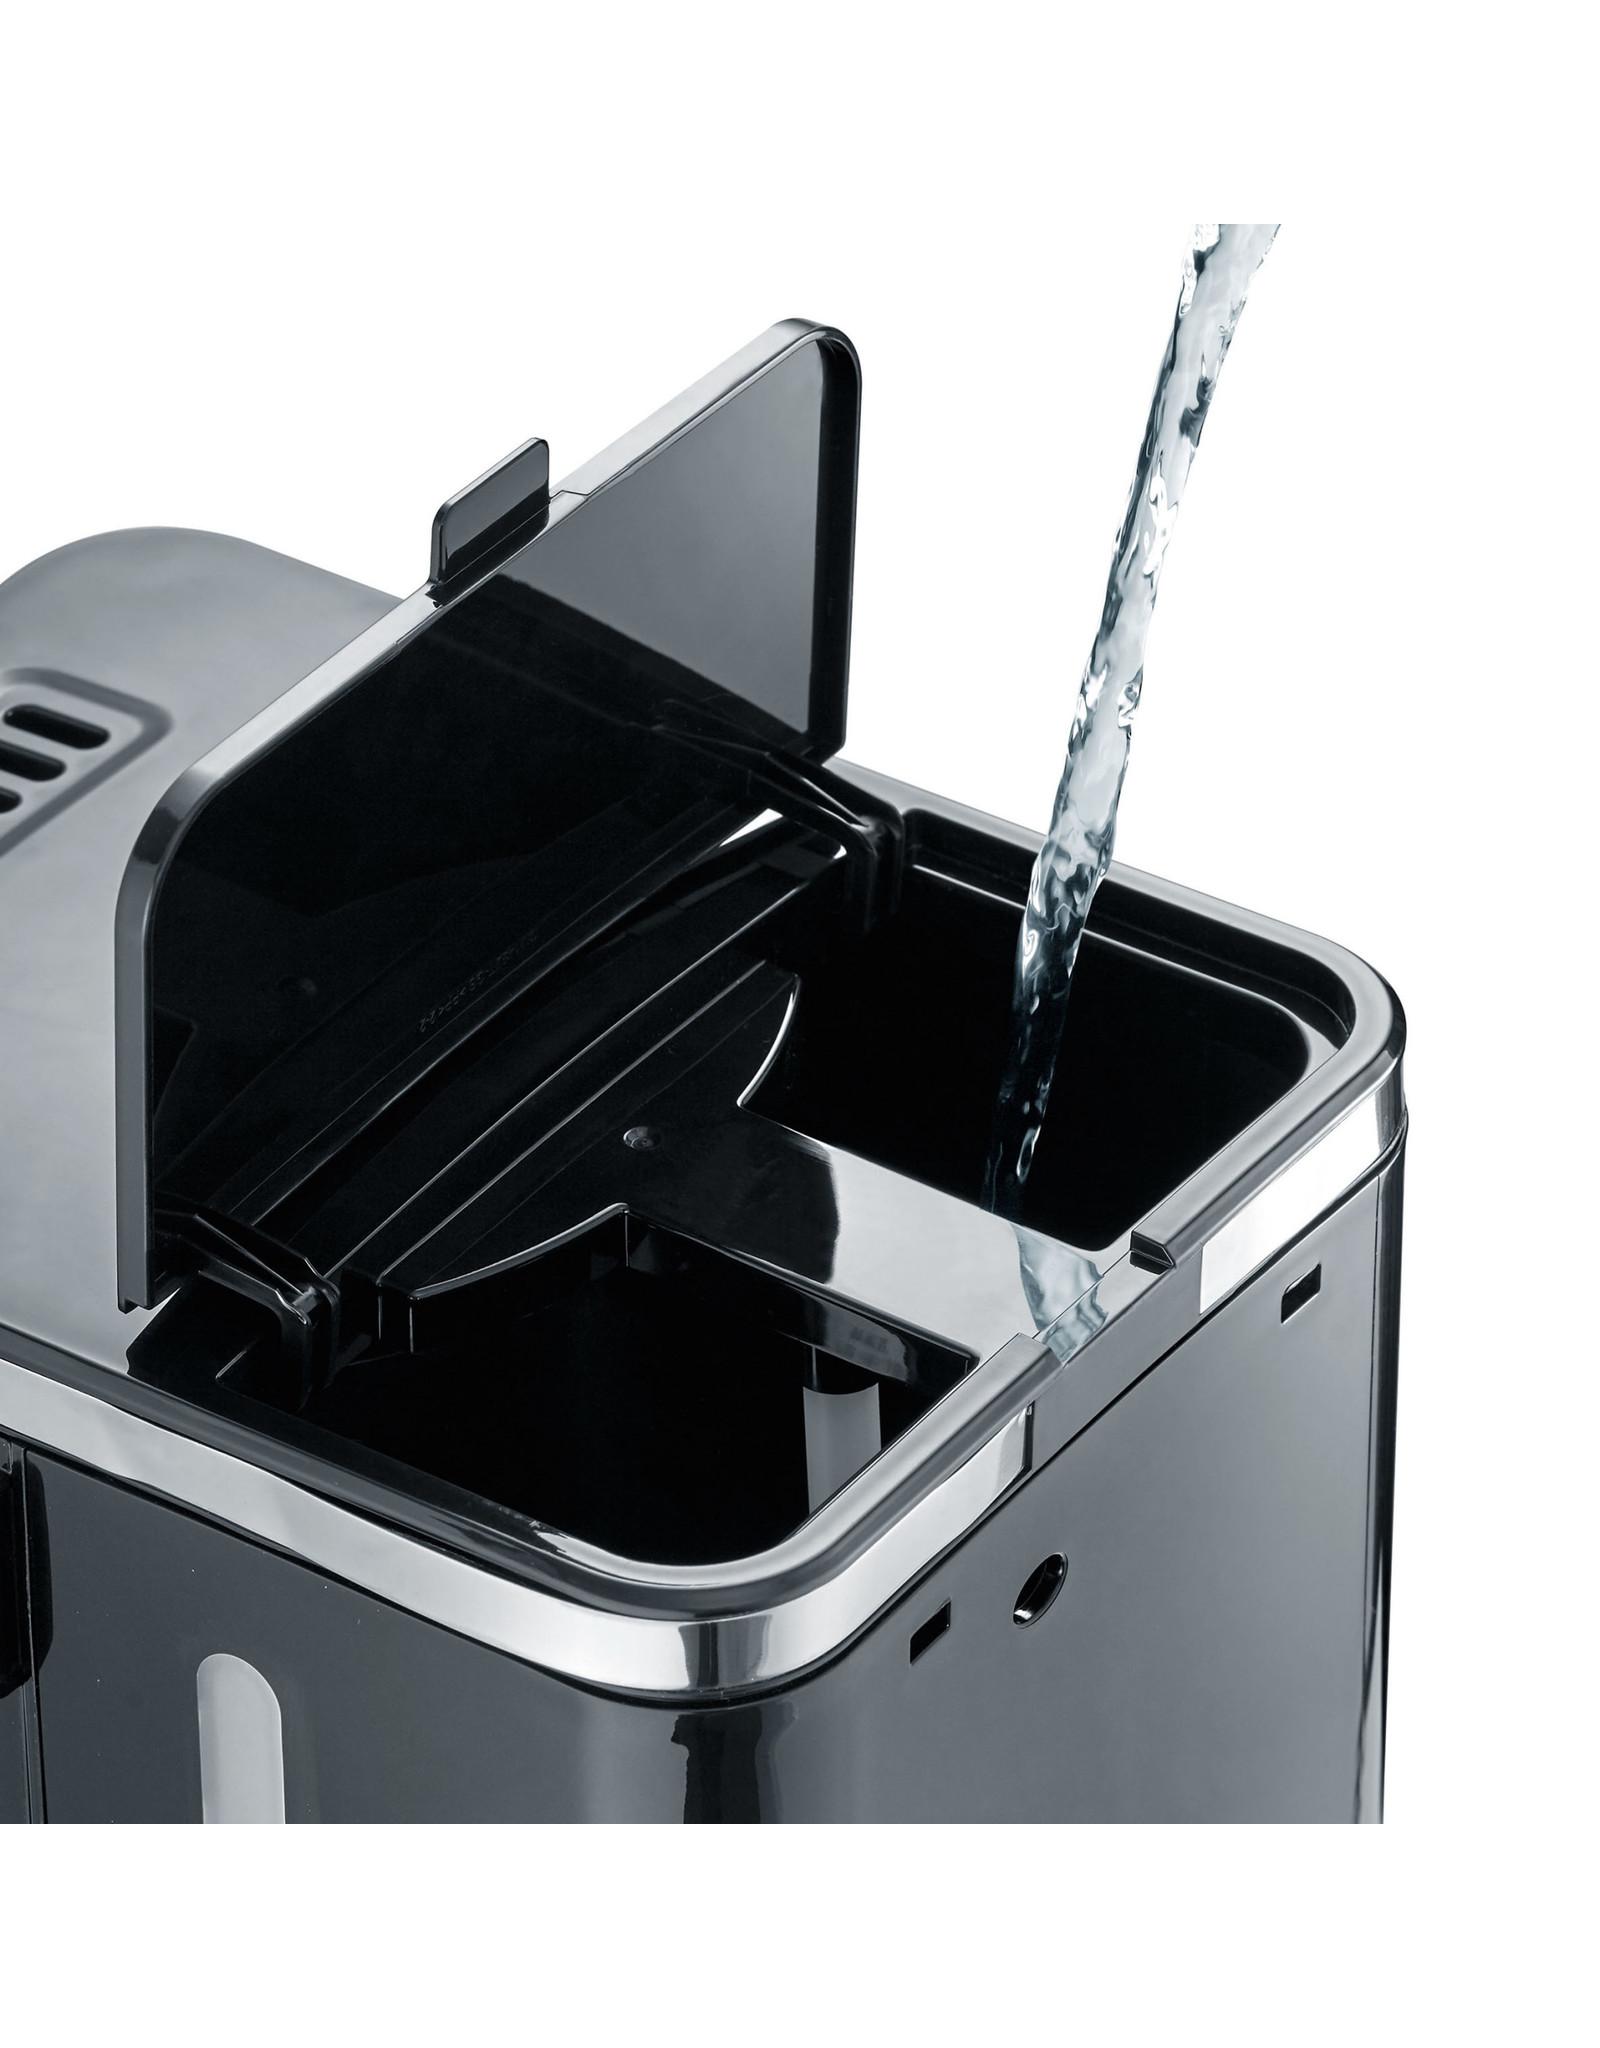 GRAEF GRAEF FK502 SNELFILTER KOFFIEAPPARAAT GLAS